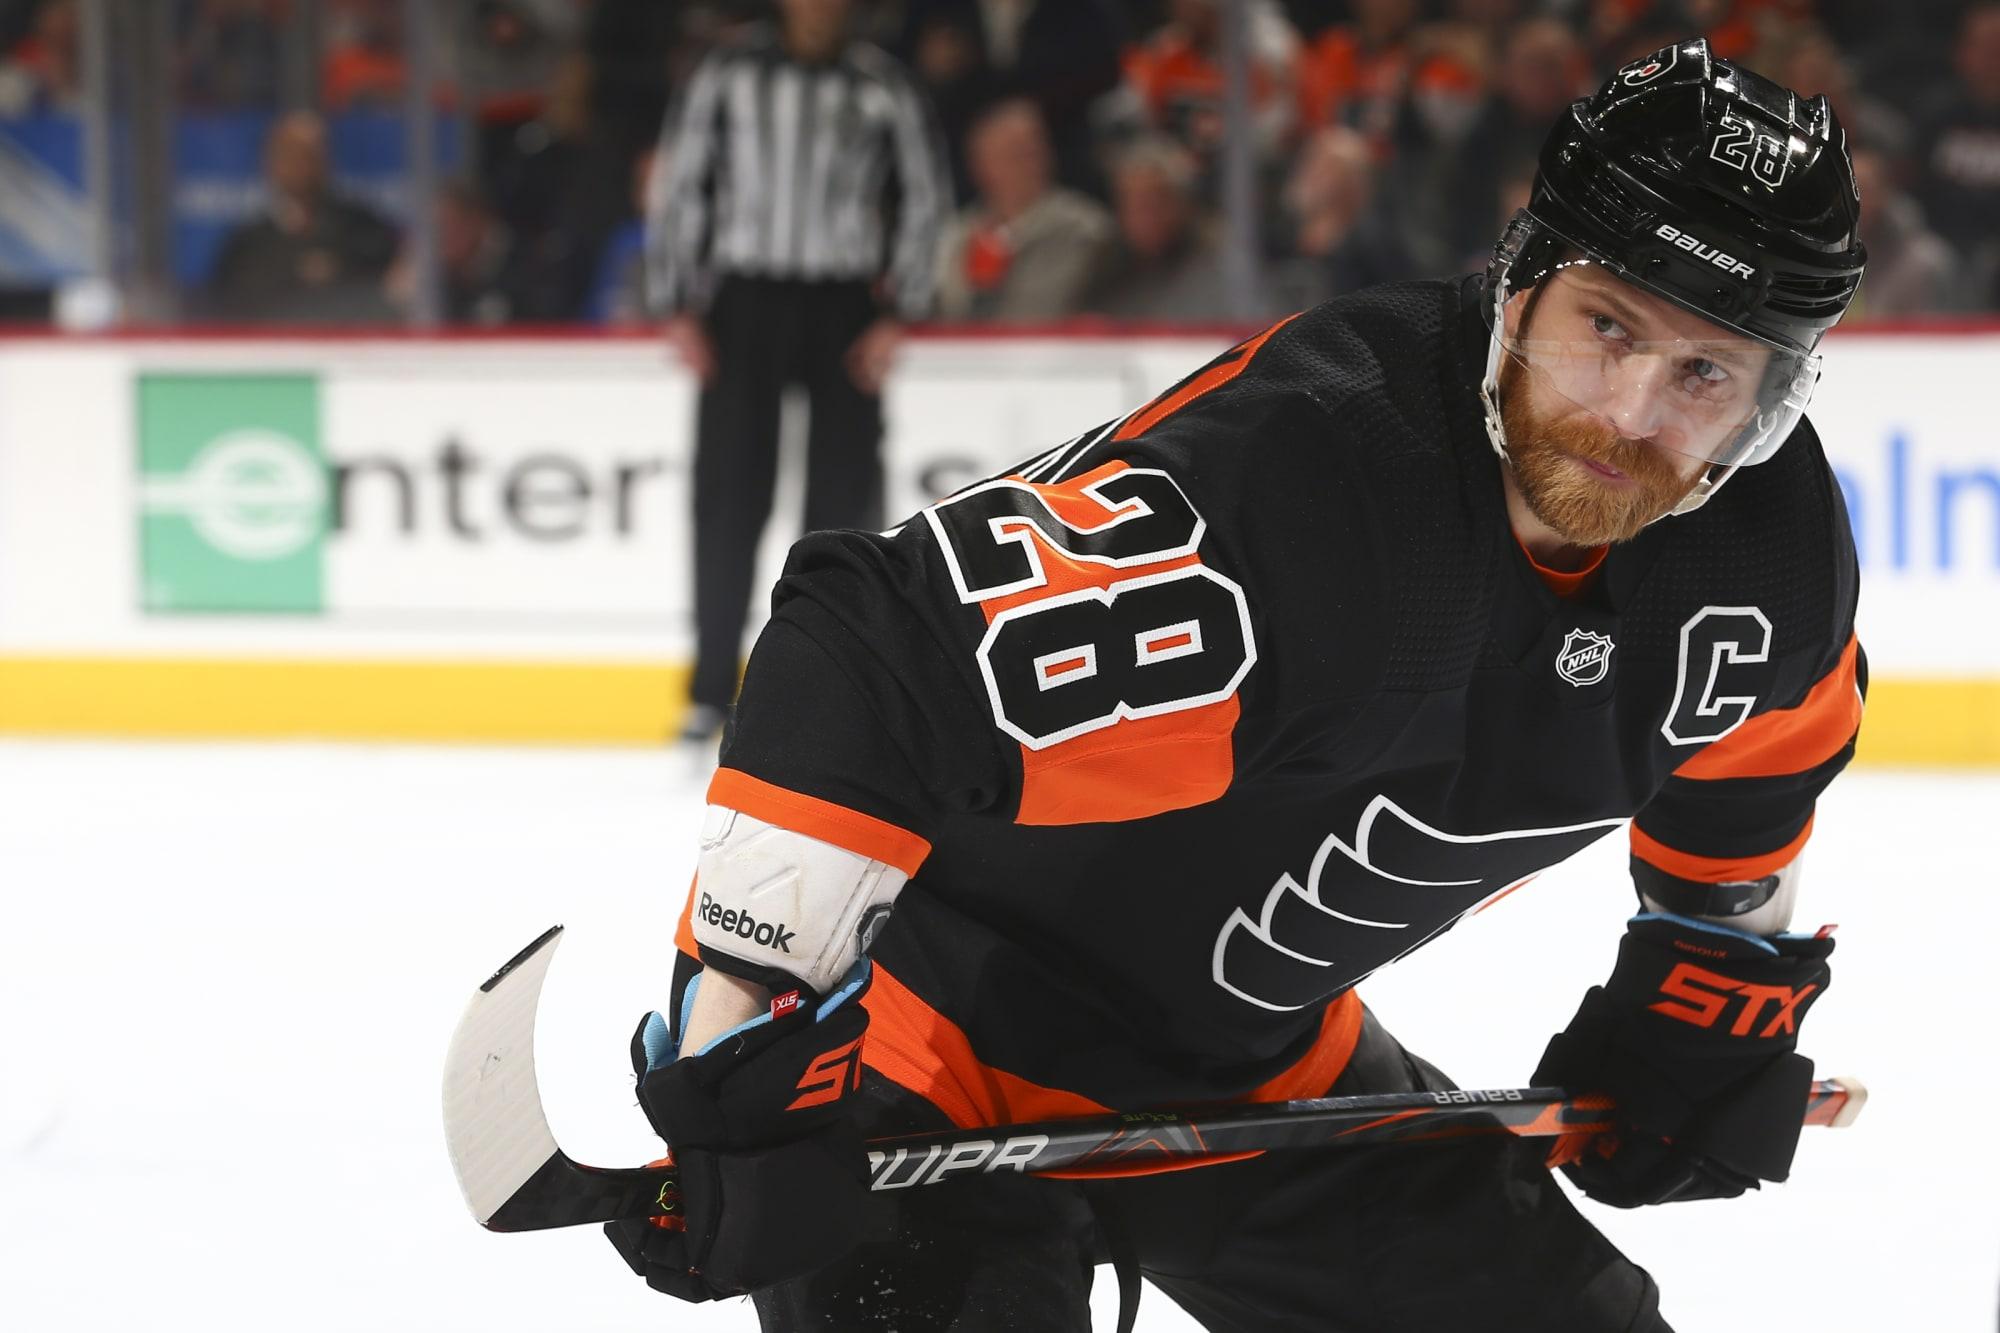 Nhl Playoffs Philadelphia Flyers Vs Montreal Canadiens Live Stream Reddit